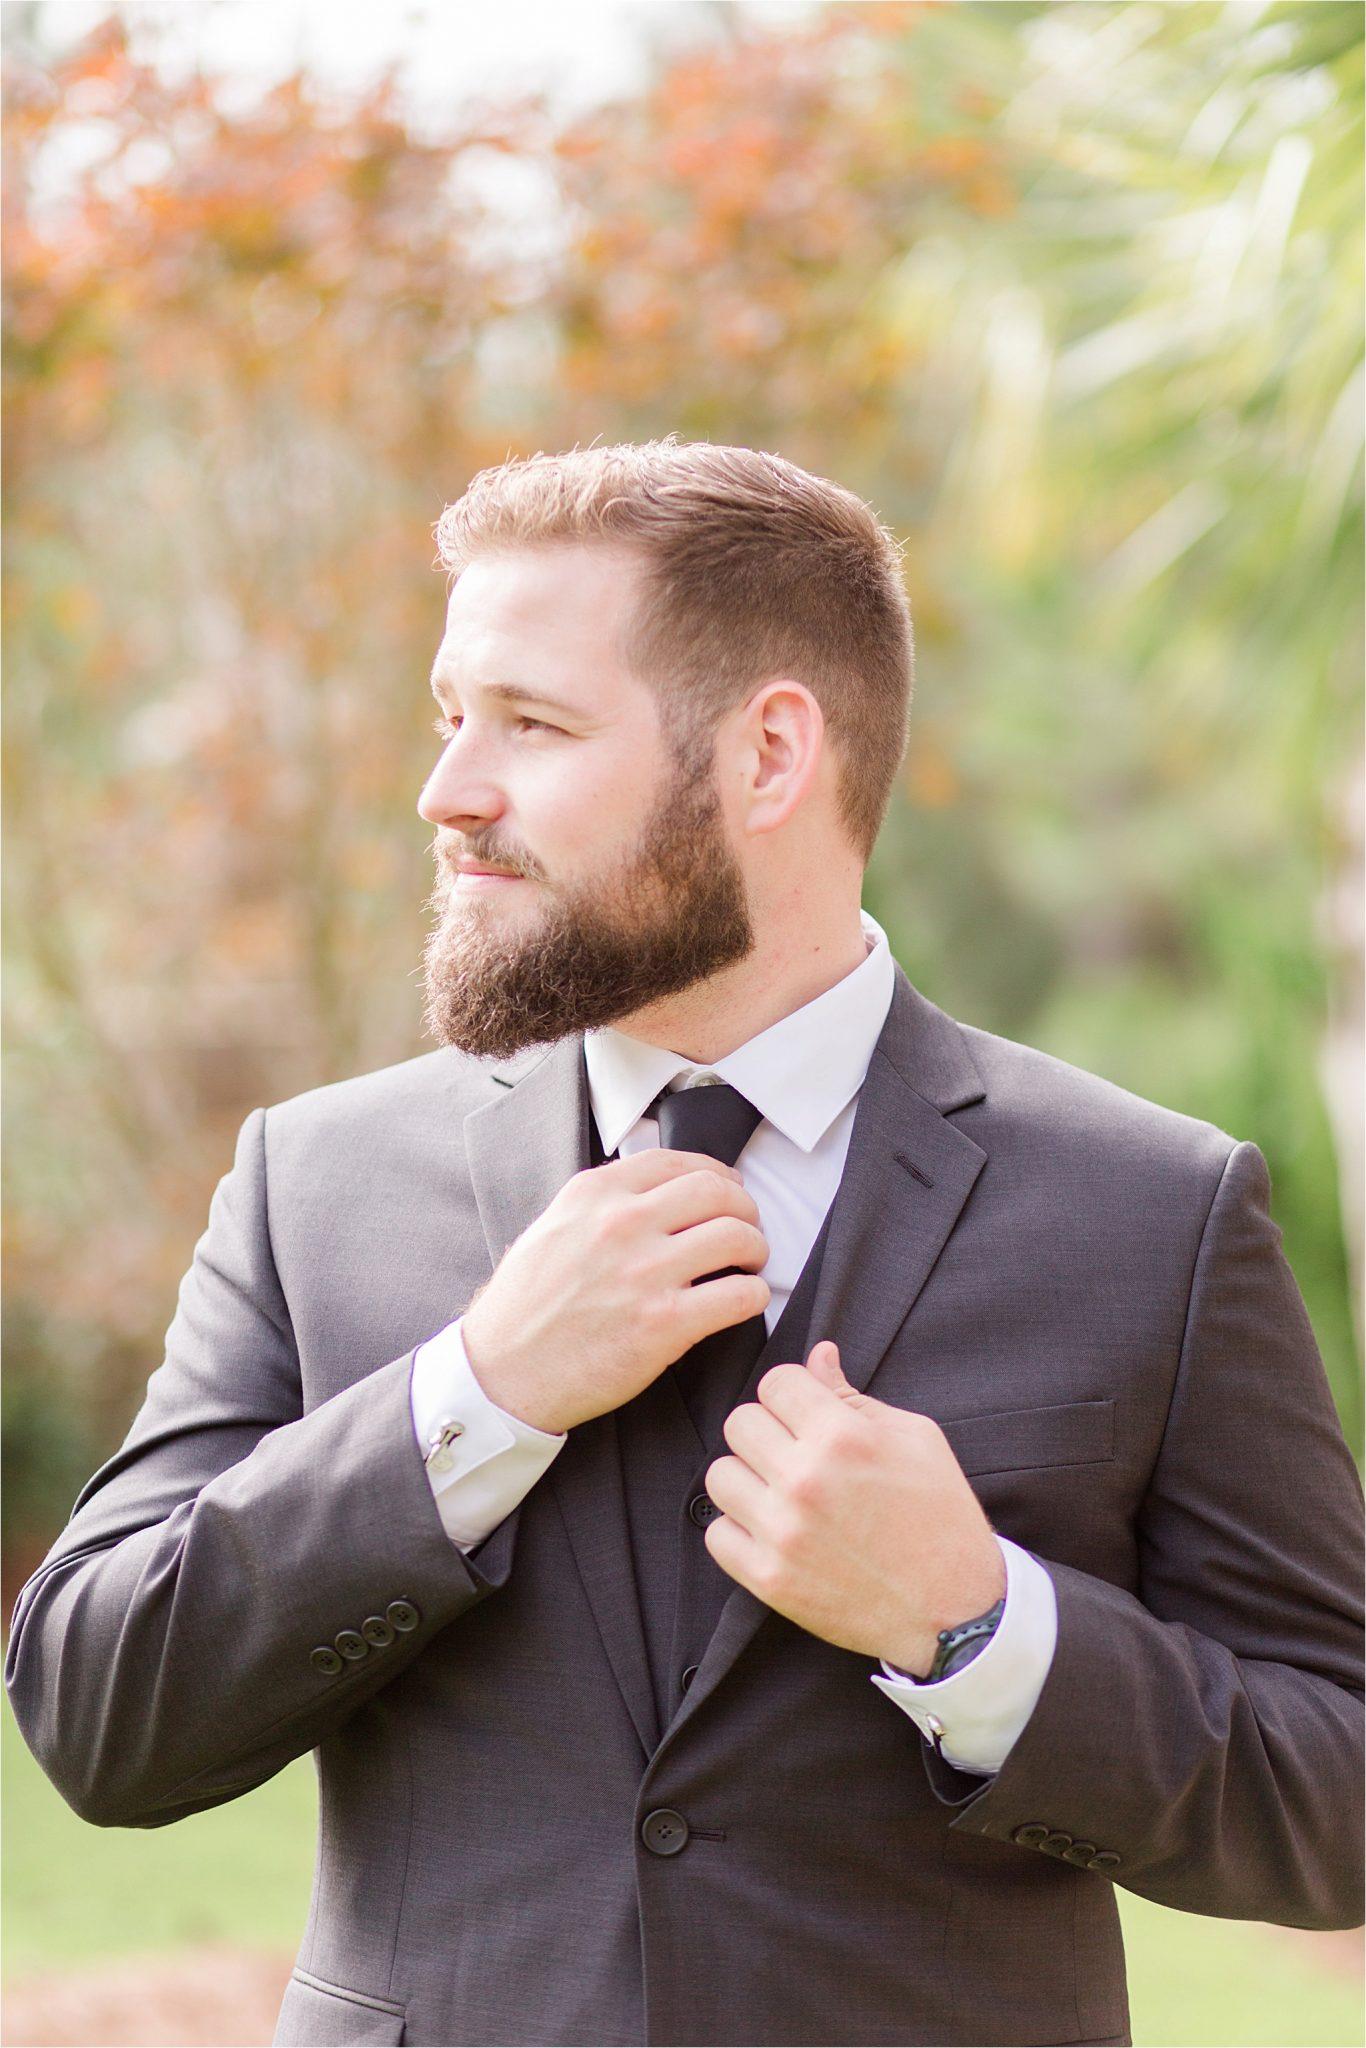 wedding day-groom-black tie-grey suit-beard-strong